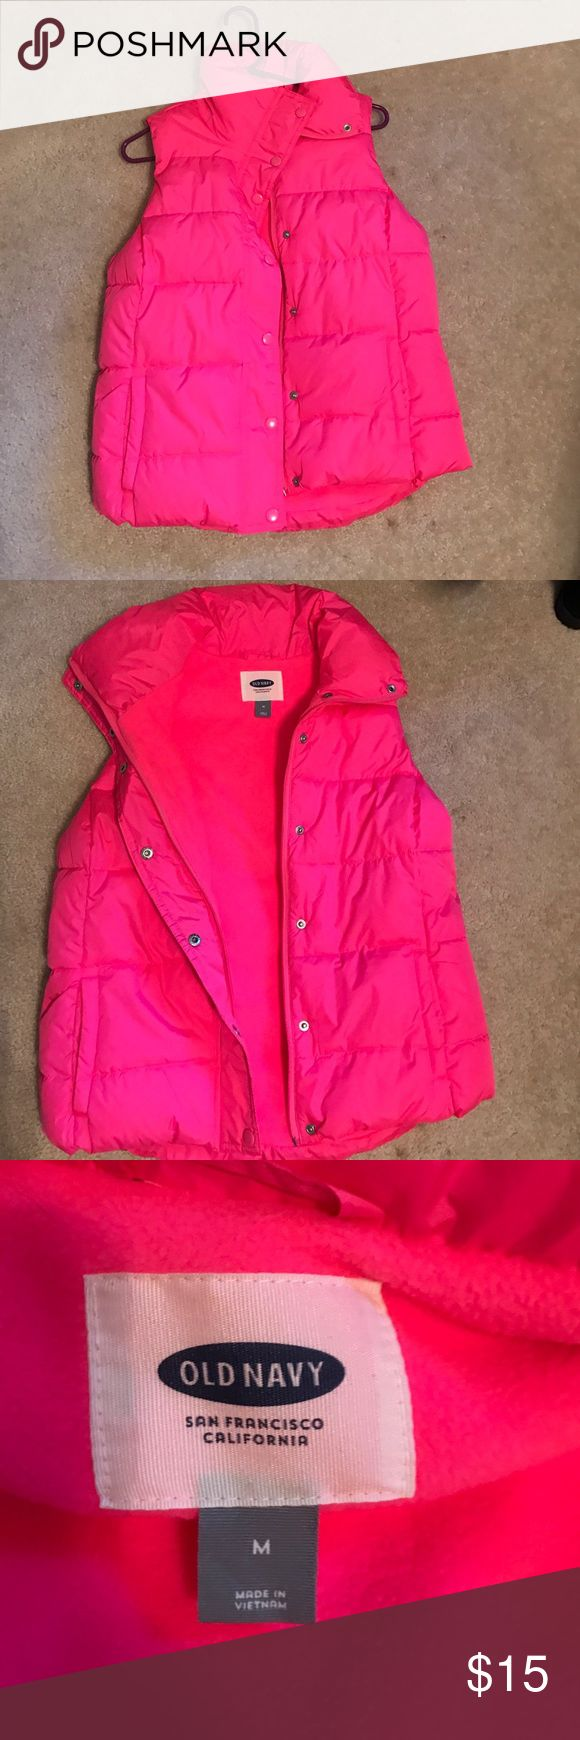 Pink vest Warm Old Navy pink vest in great shape! Size M Old Navy Tops